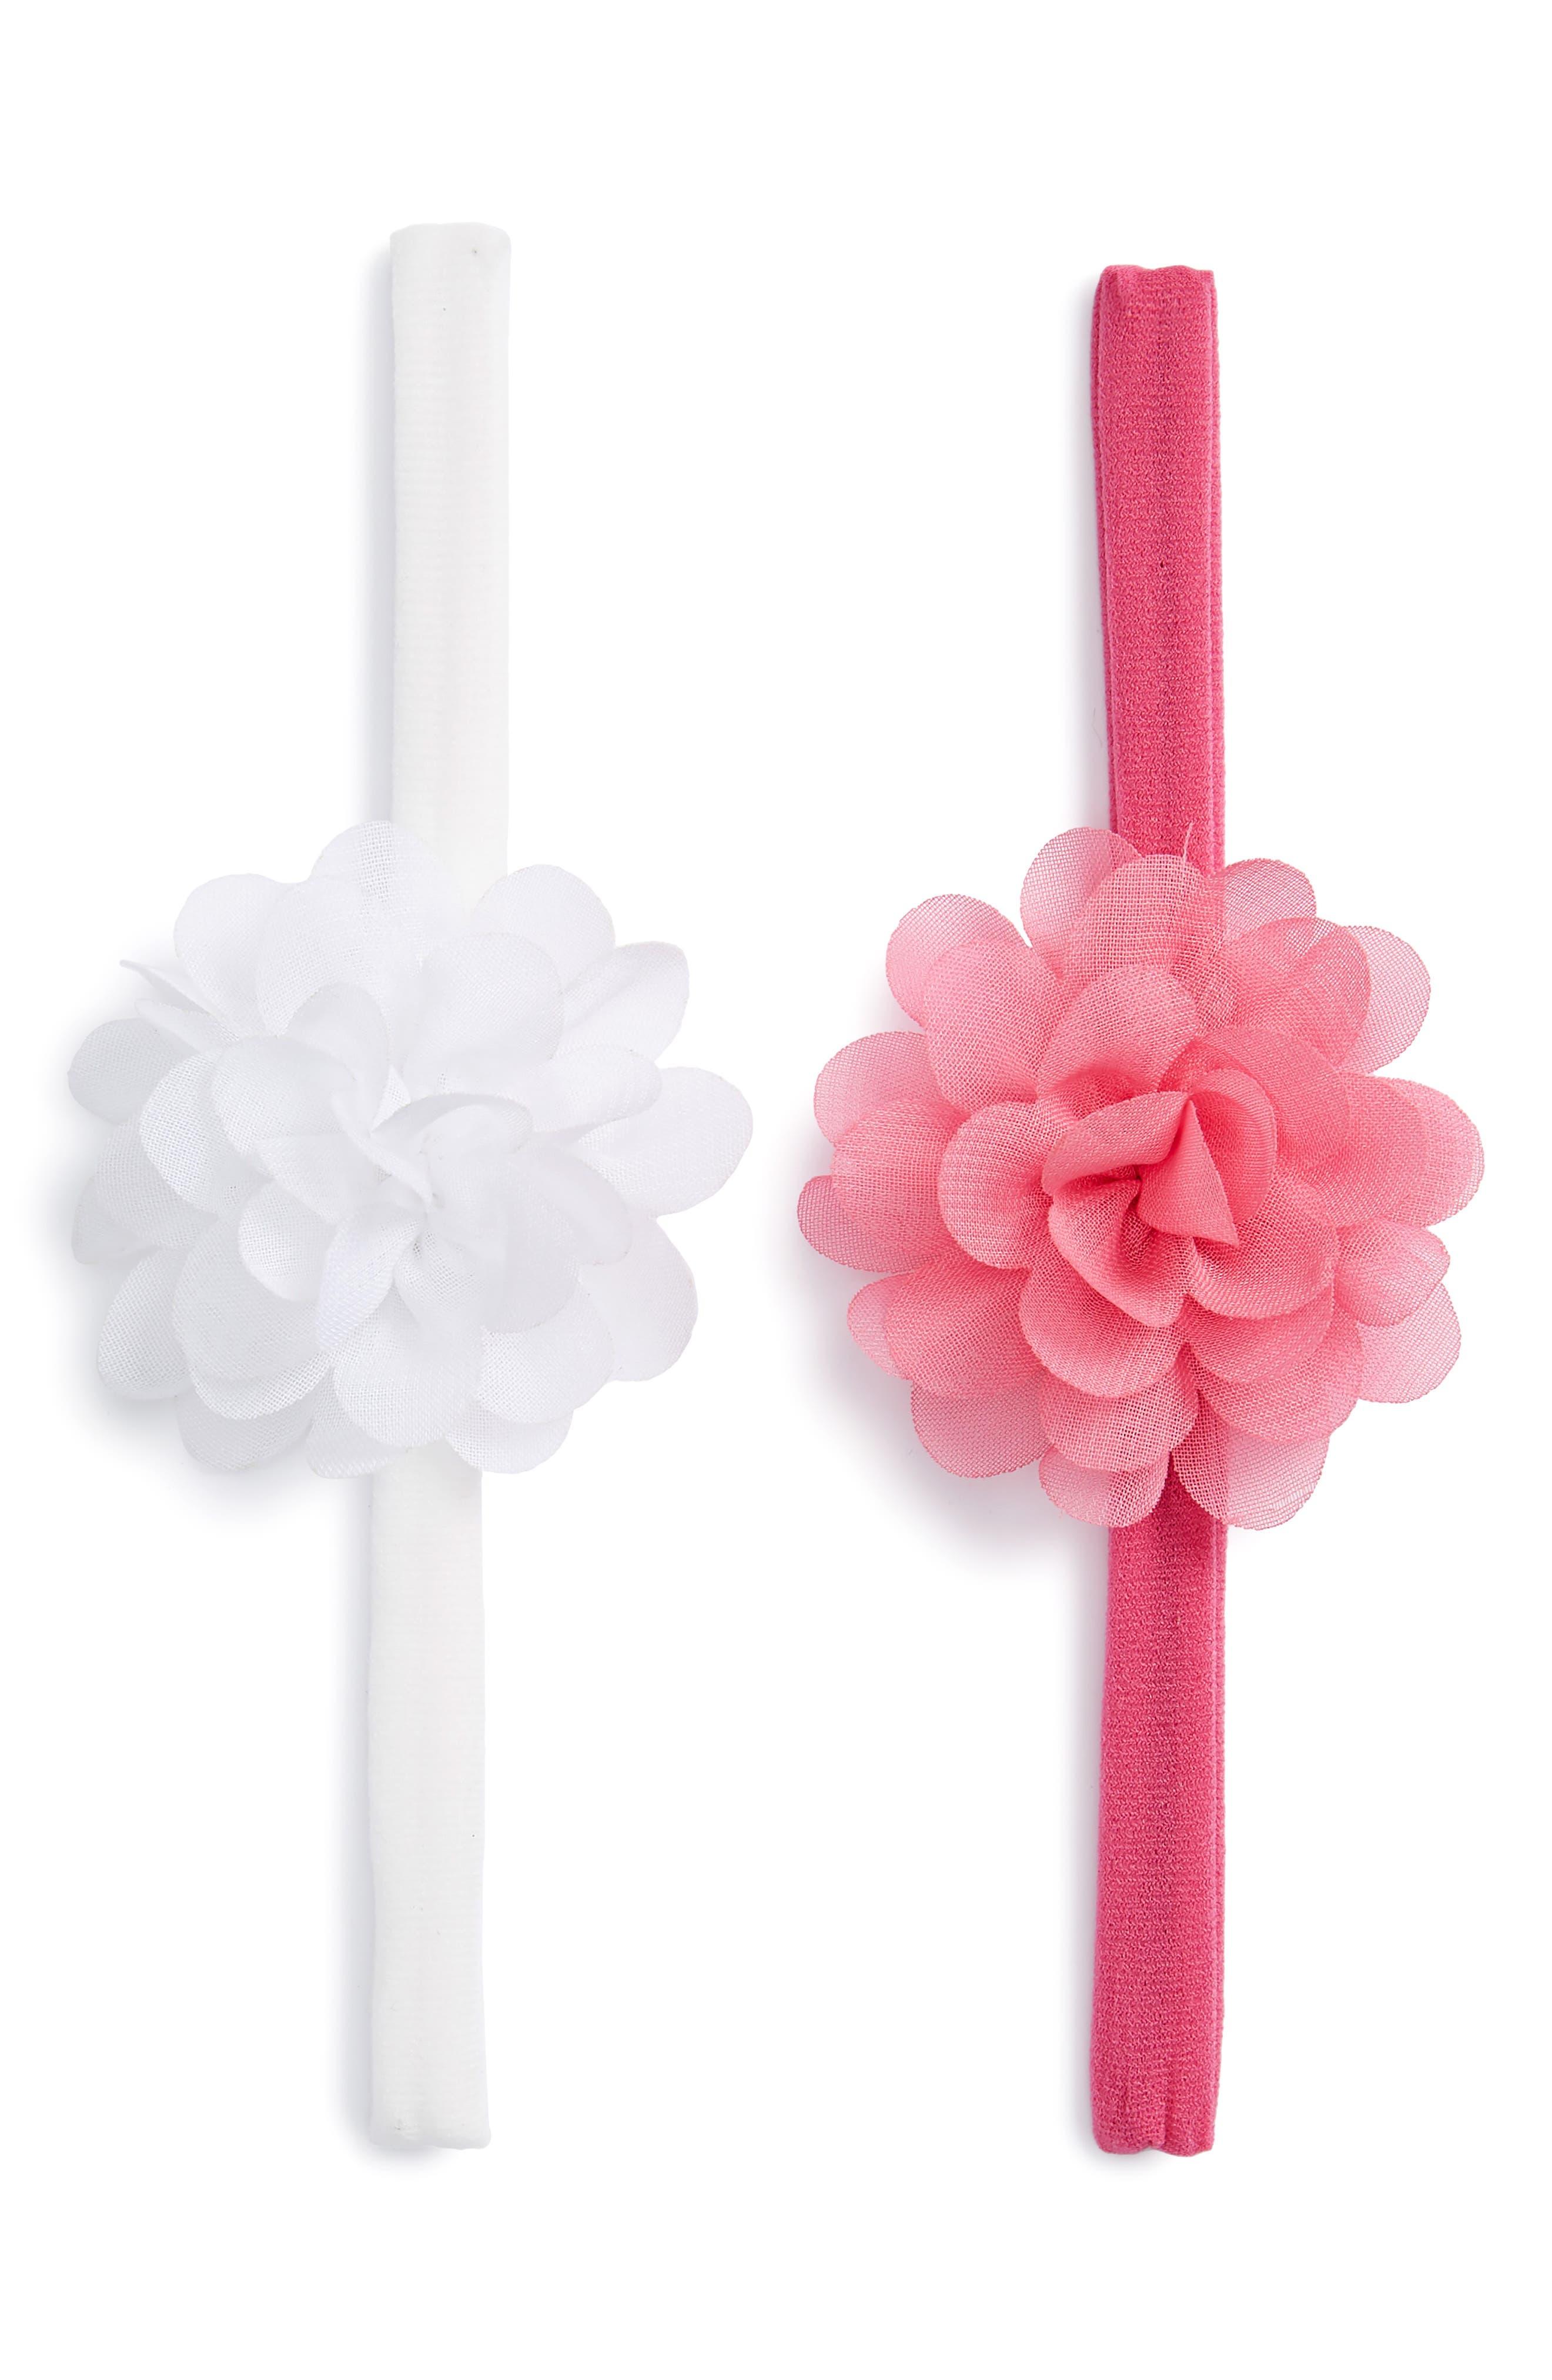 Set of 2 Mini Flower Headbands,                             Main thumbnail 1, color,                             White/ Hot Pink